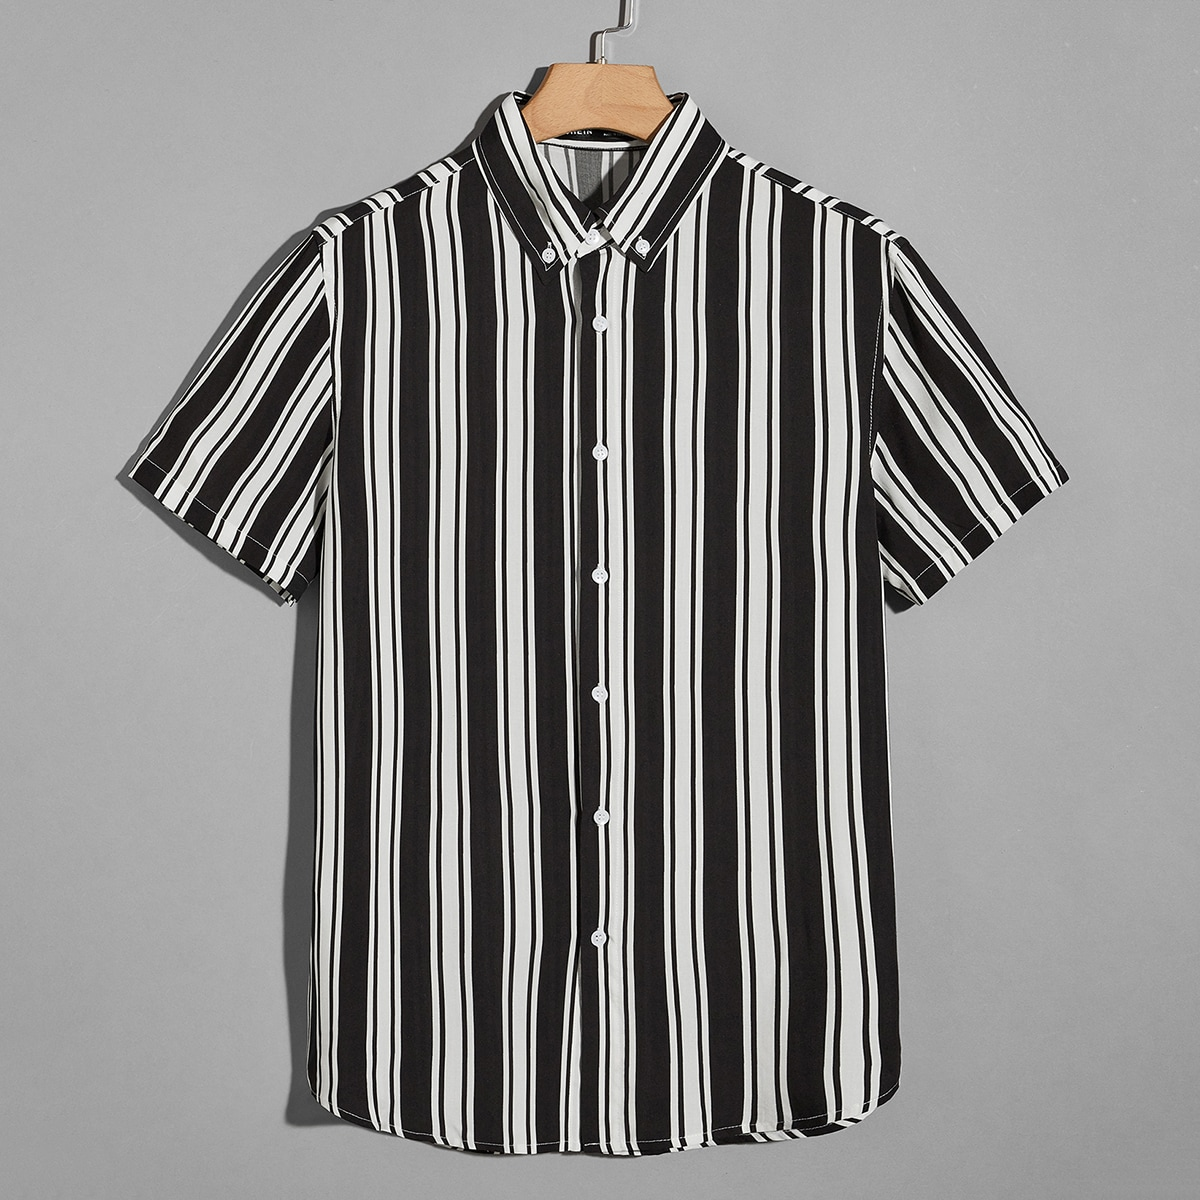 Мужская рубашка на пуговицах в полоску SheIn smshirt07210525684